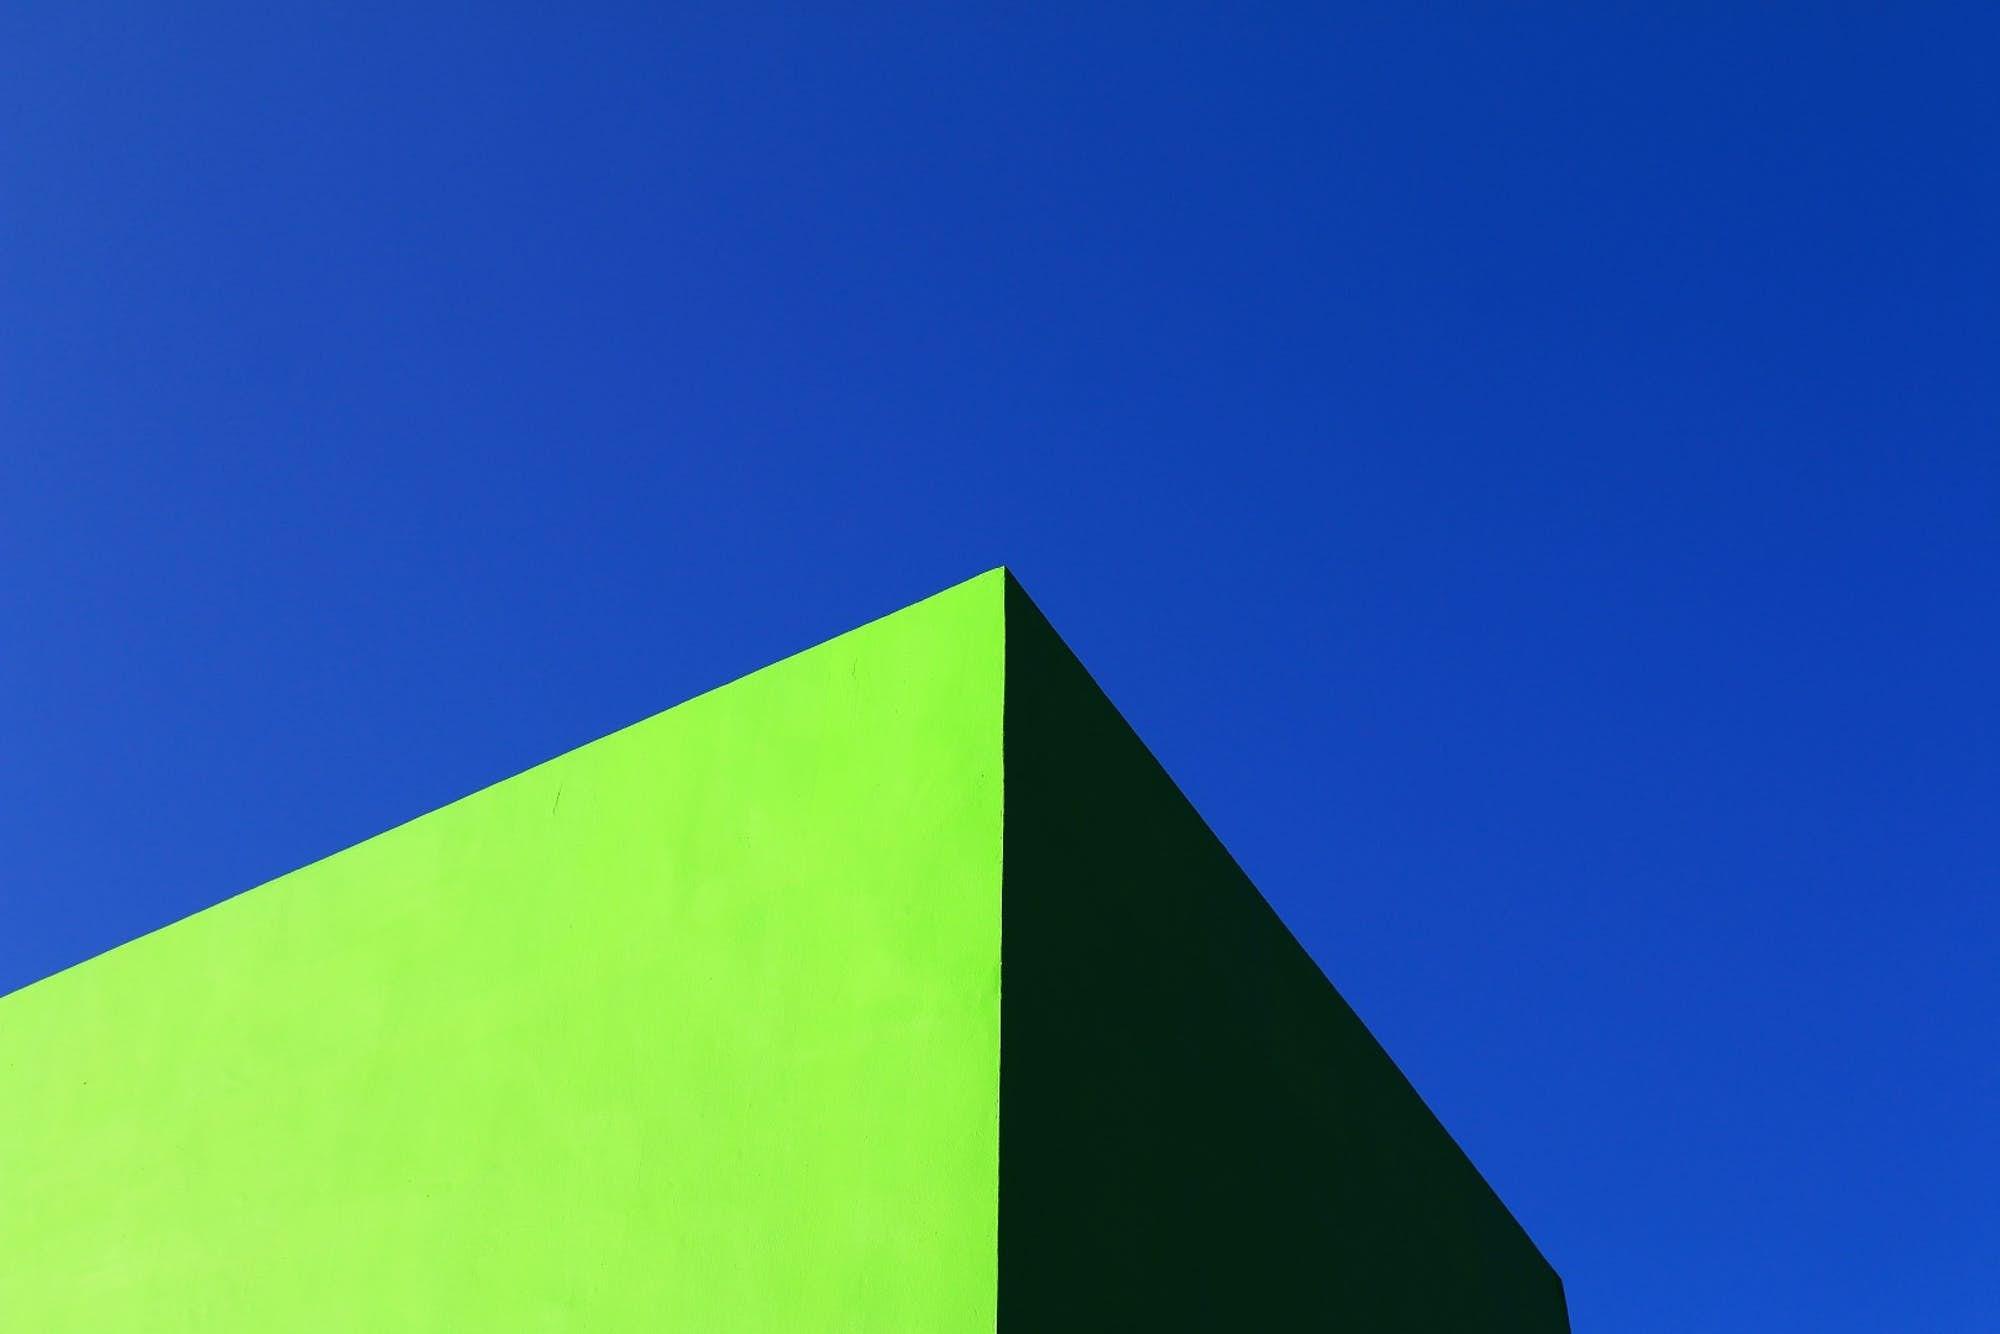 1489147920_minimalist-duvar-kagidi-9.jpg